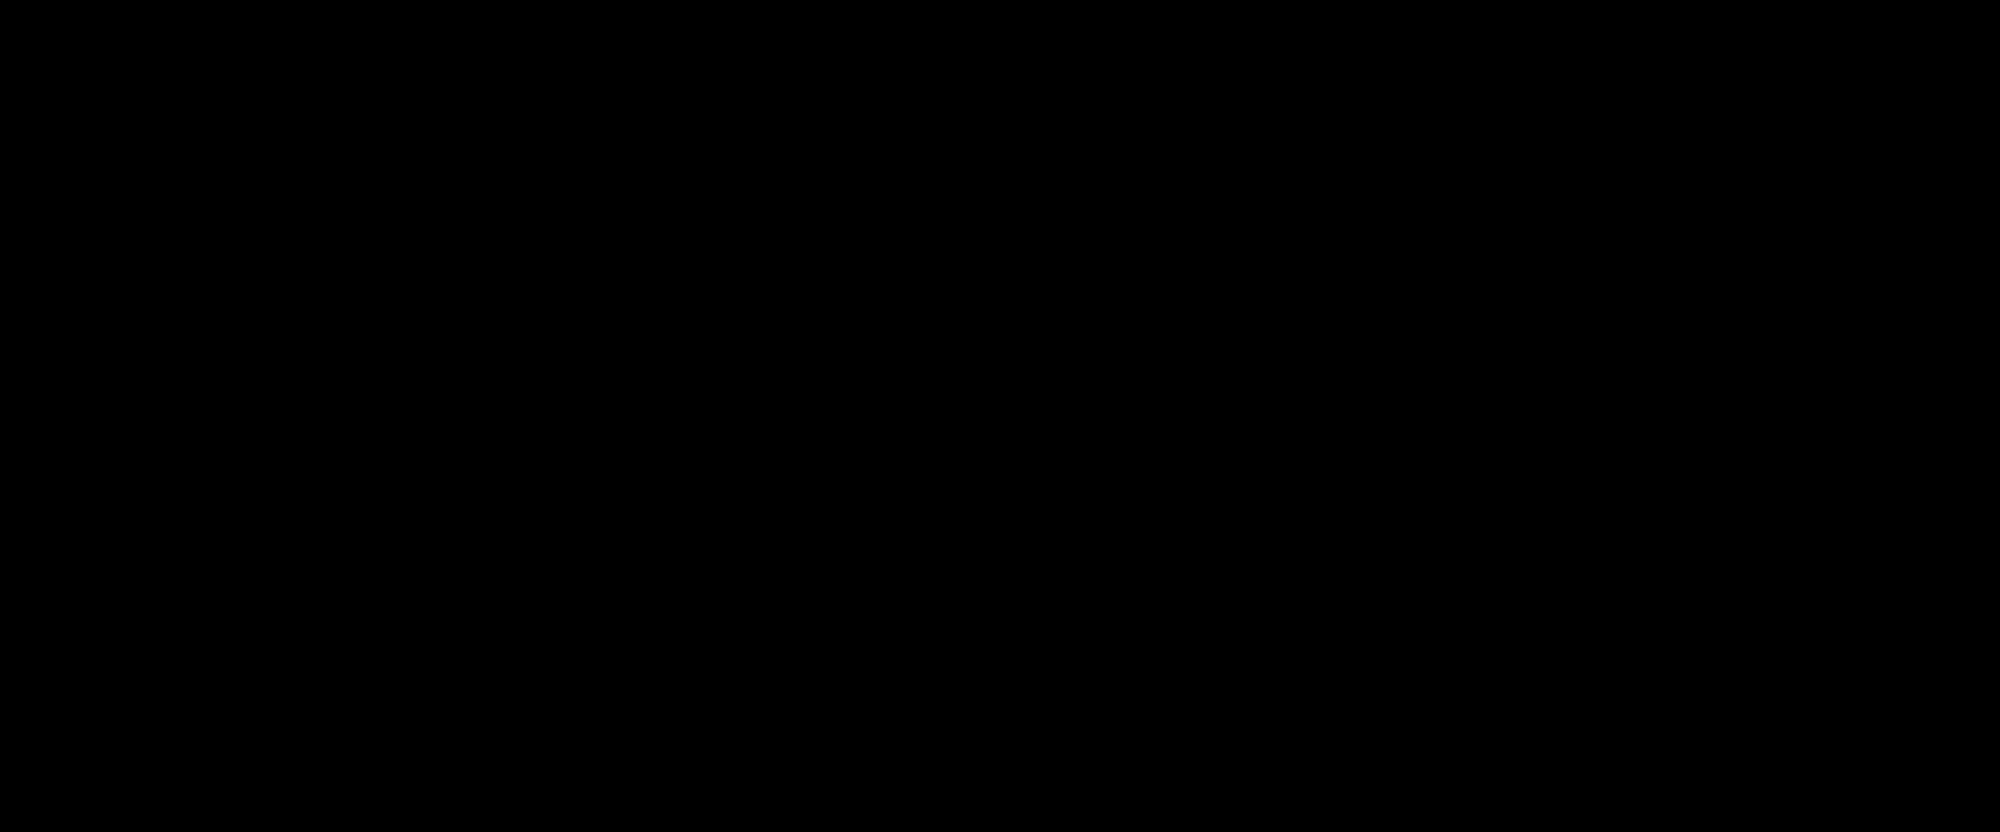 Pro-Life Princesses-logo-black.png